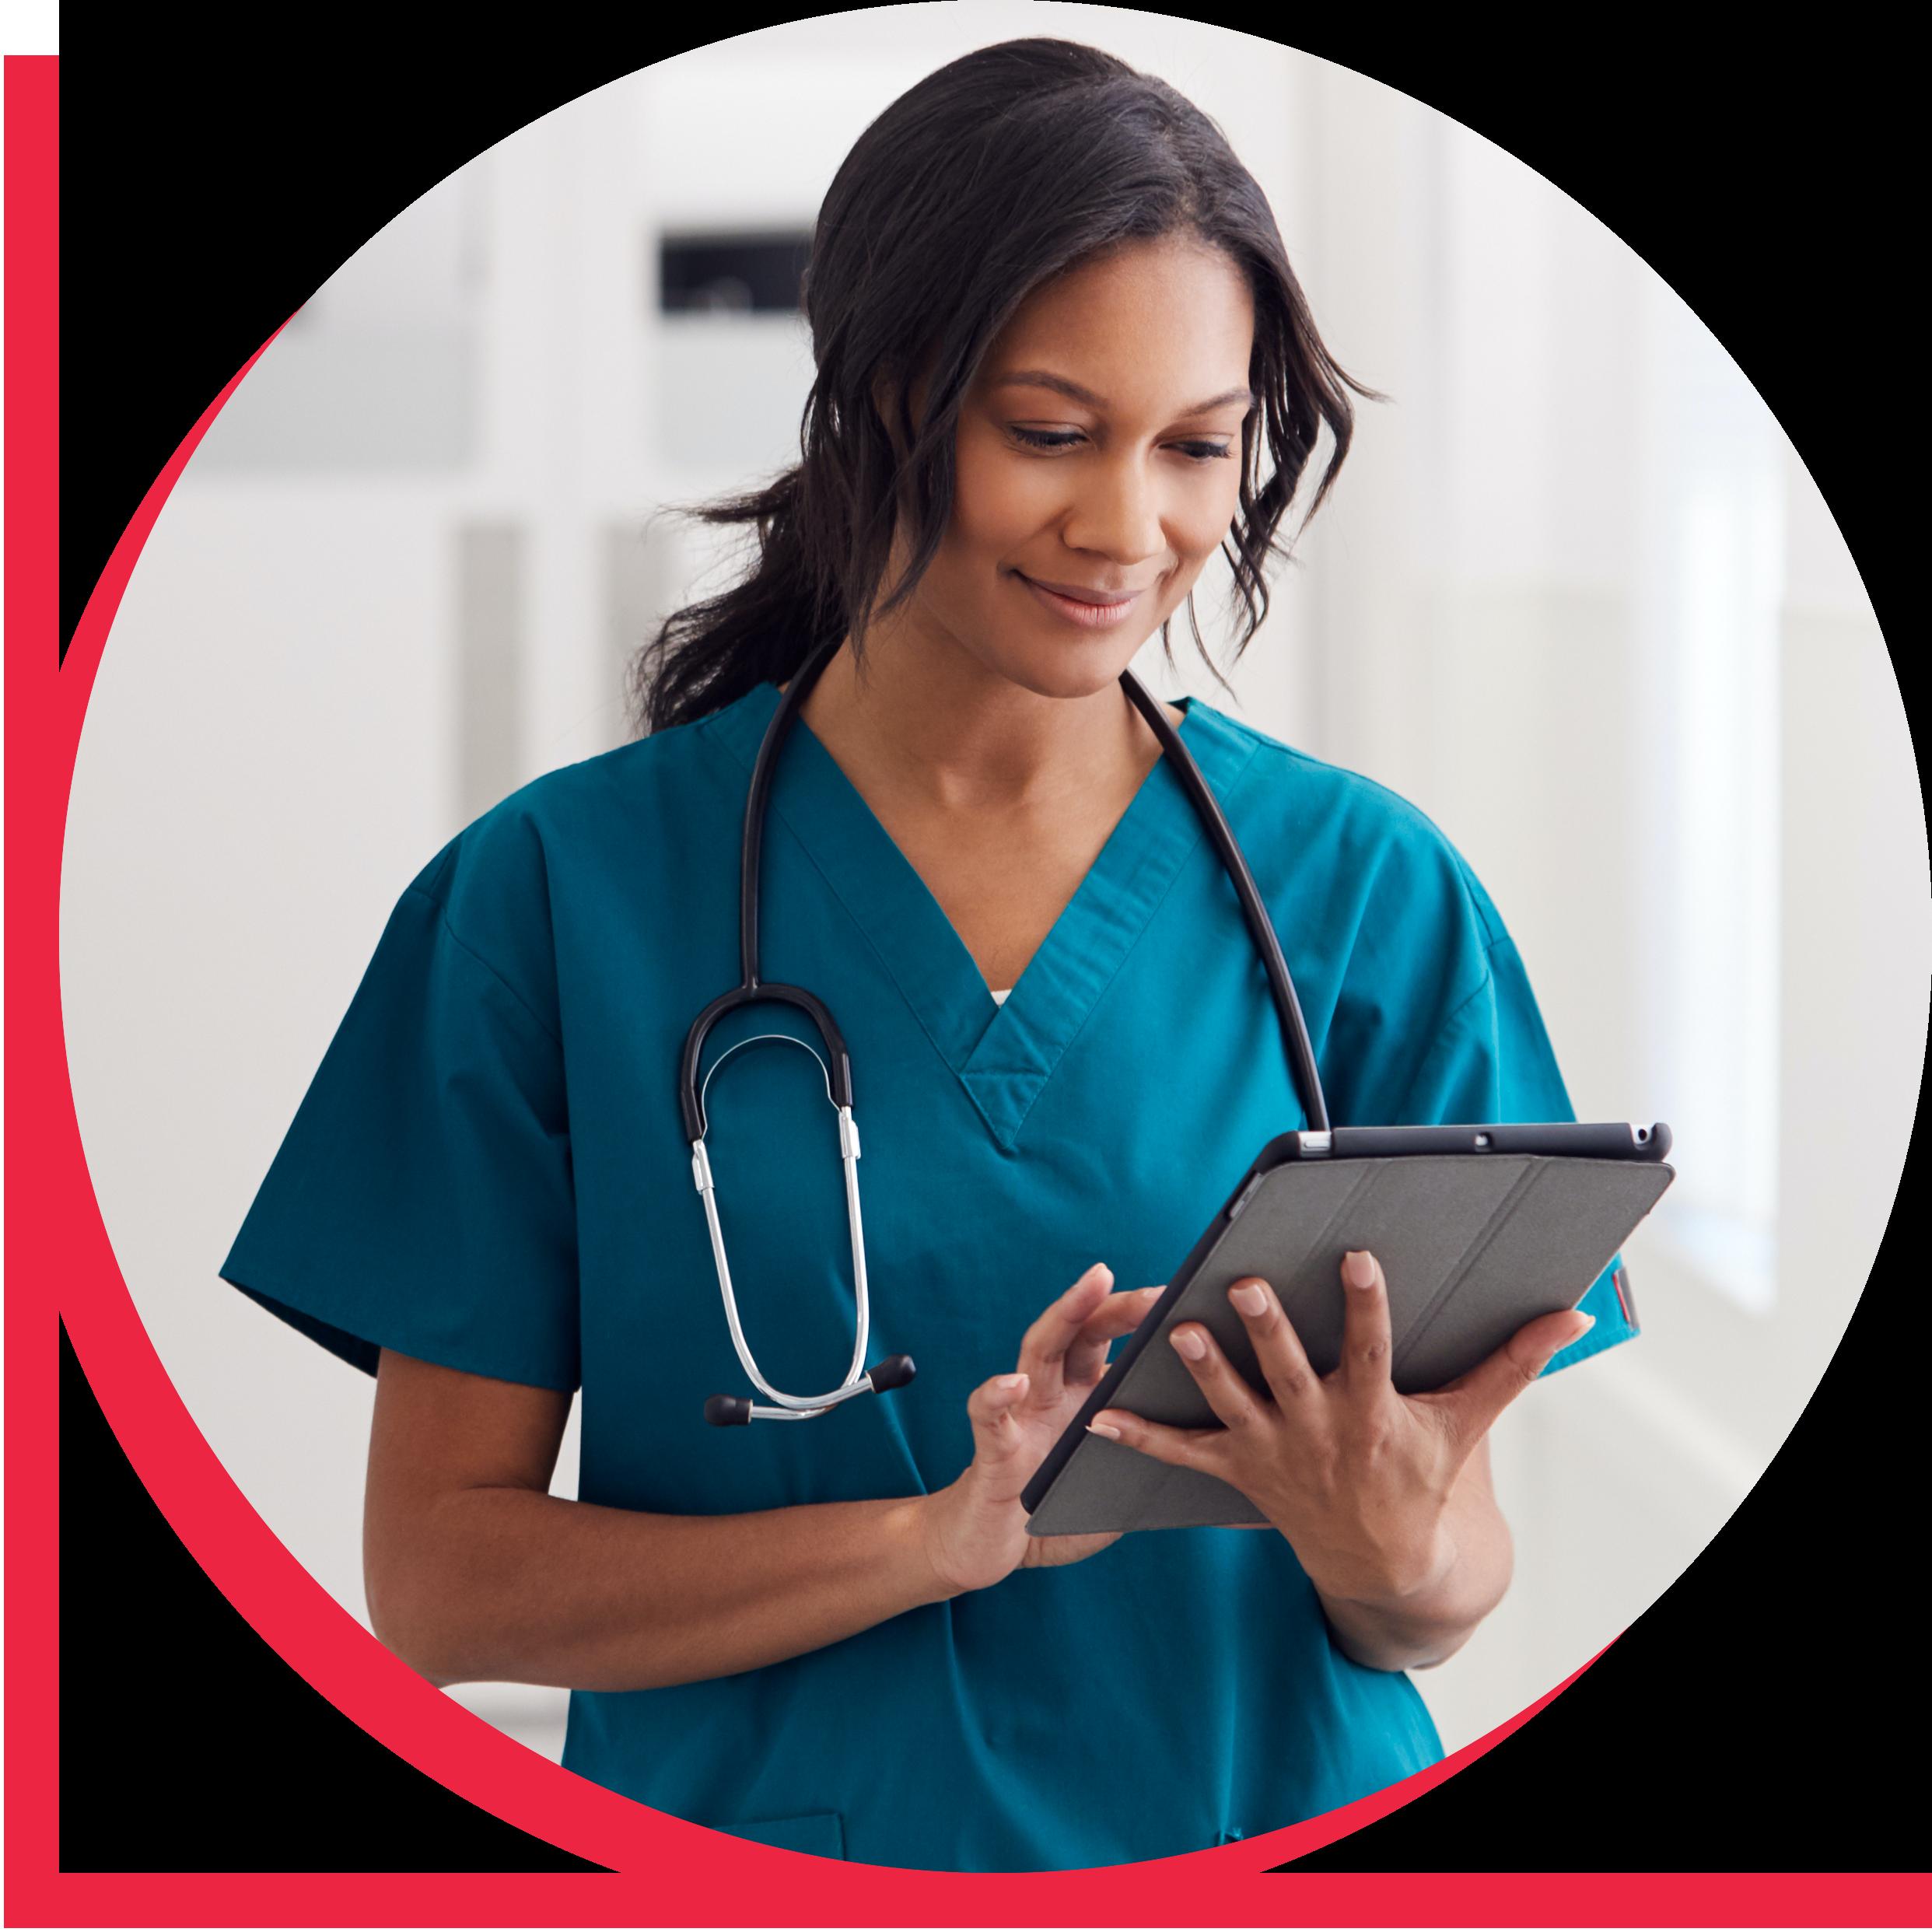 nurse tablet_red boarder